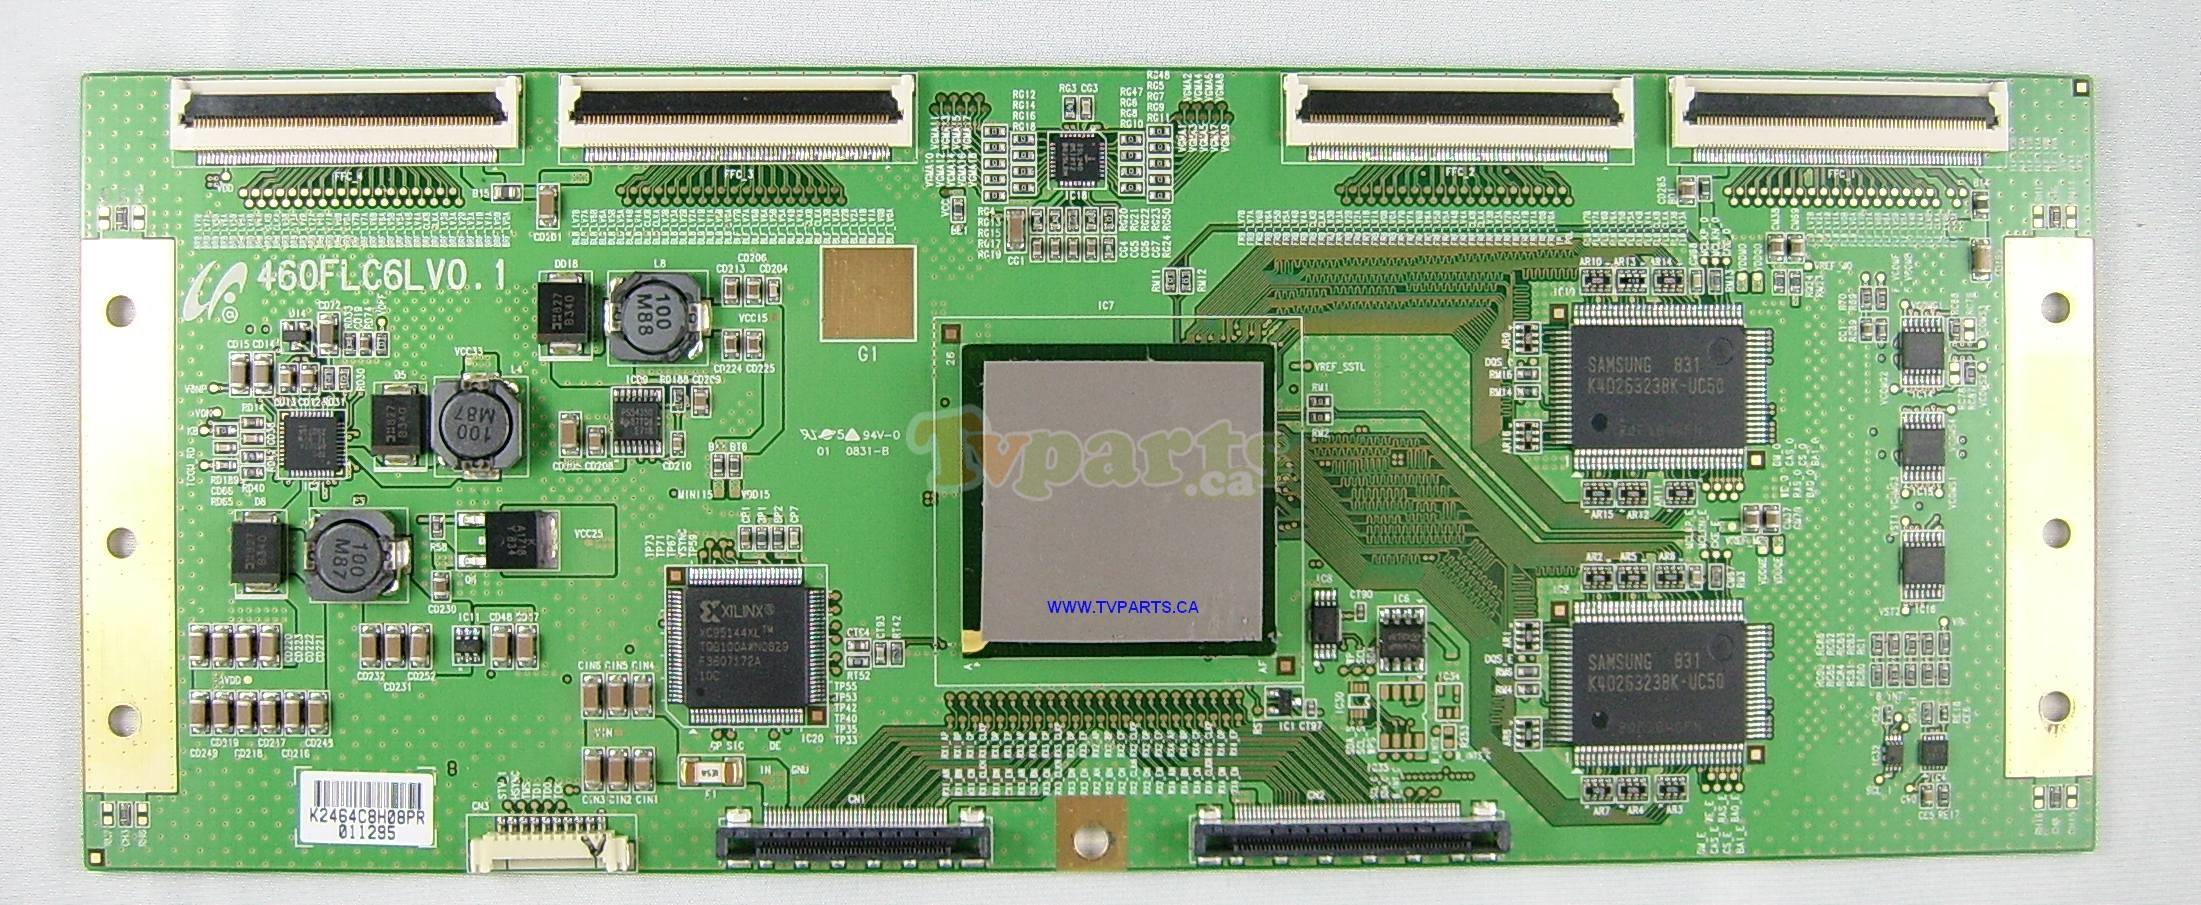 LCD TV Sony Bravia KDL-46X4500AEP - vertical stripes on the